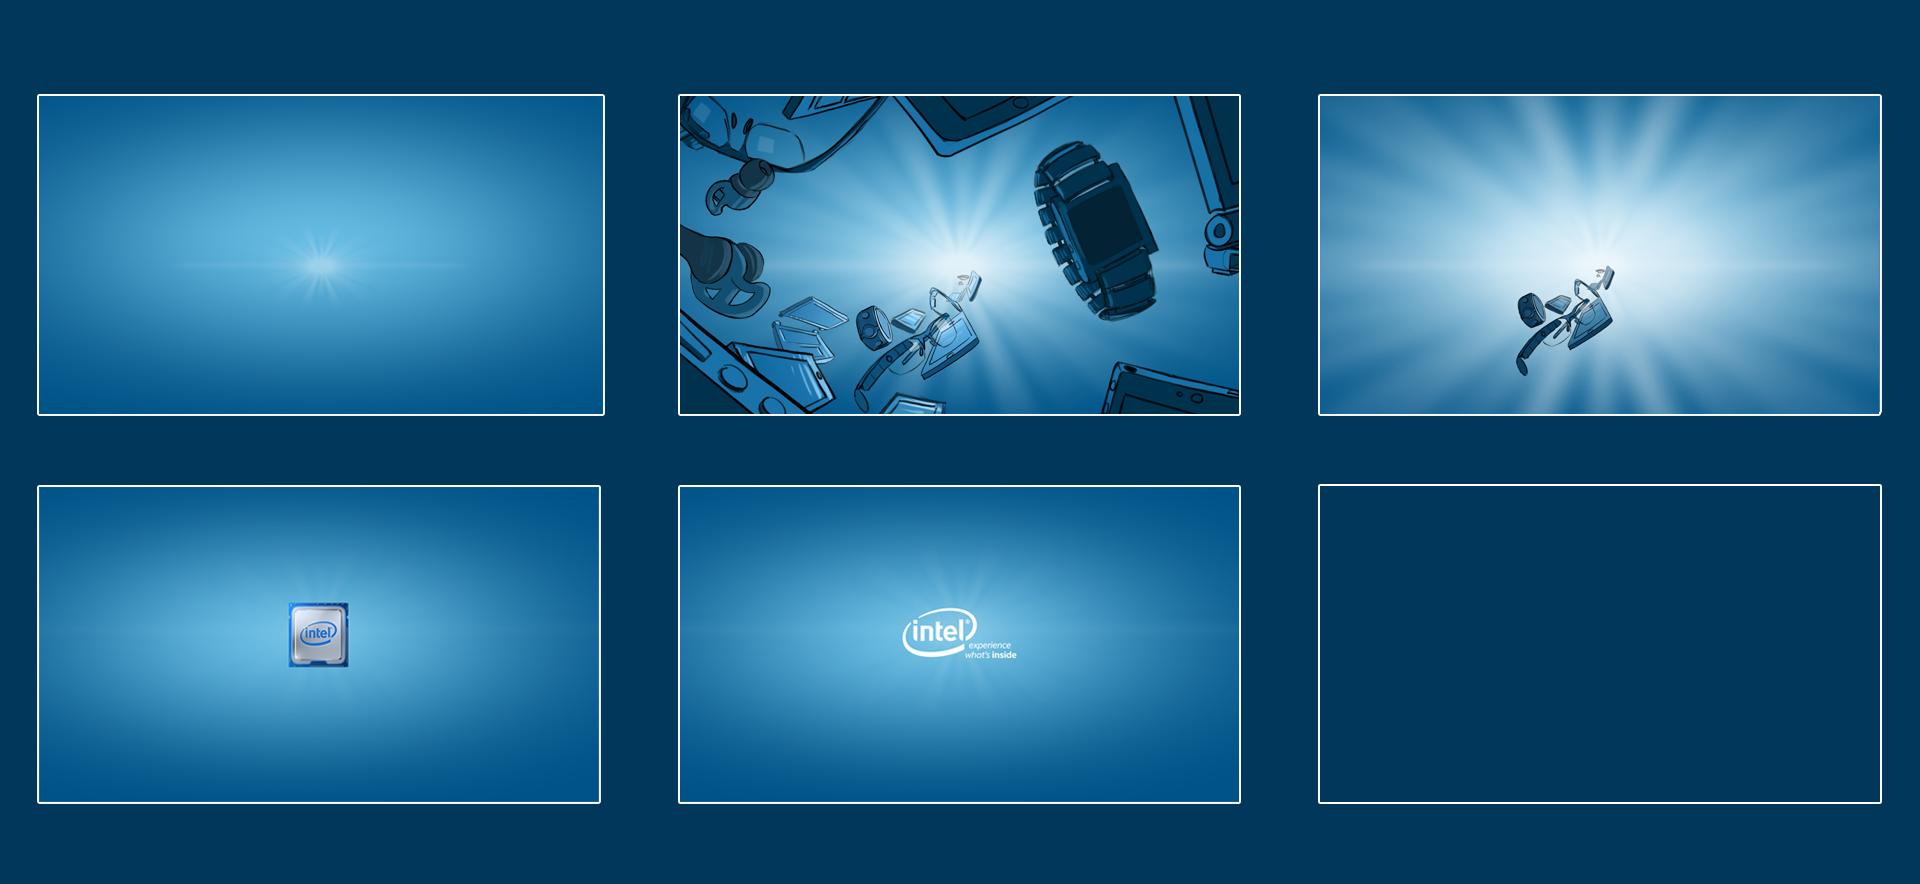 Intel - Signature ID concept